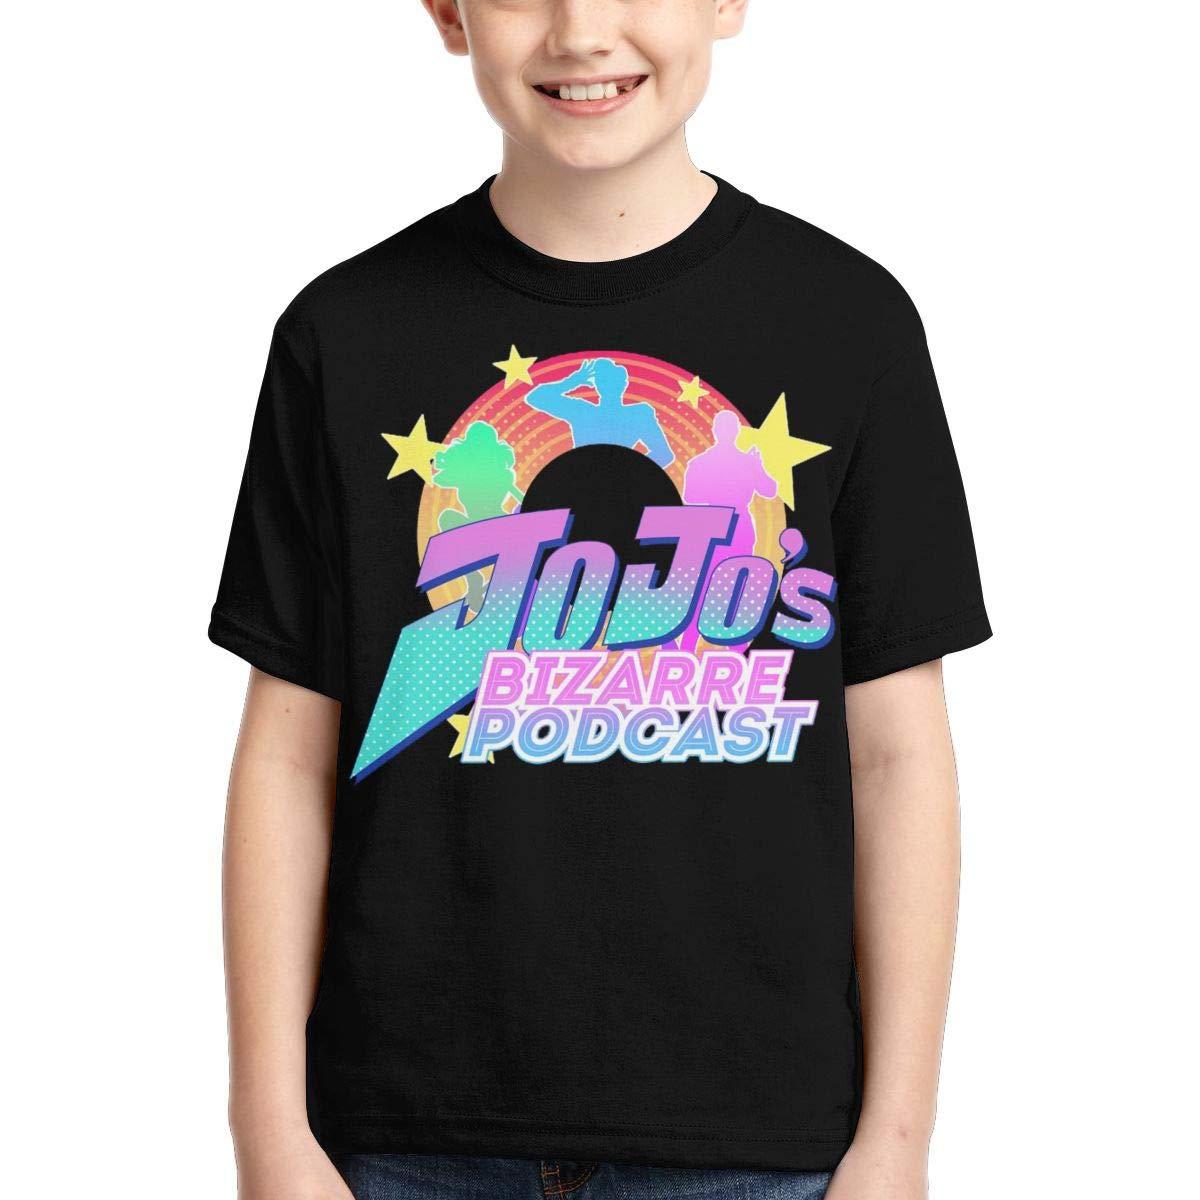 Zengqinglove Boys,Girls,Youth JoJos Bizarre Adventure T Shirt